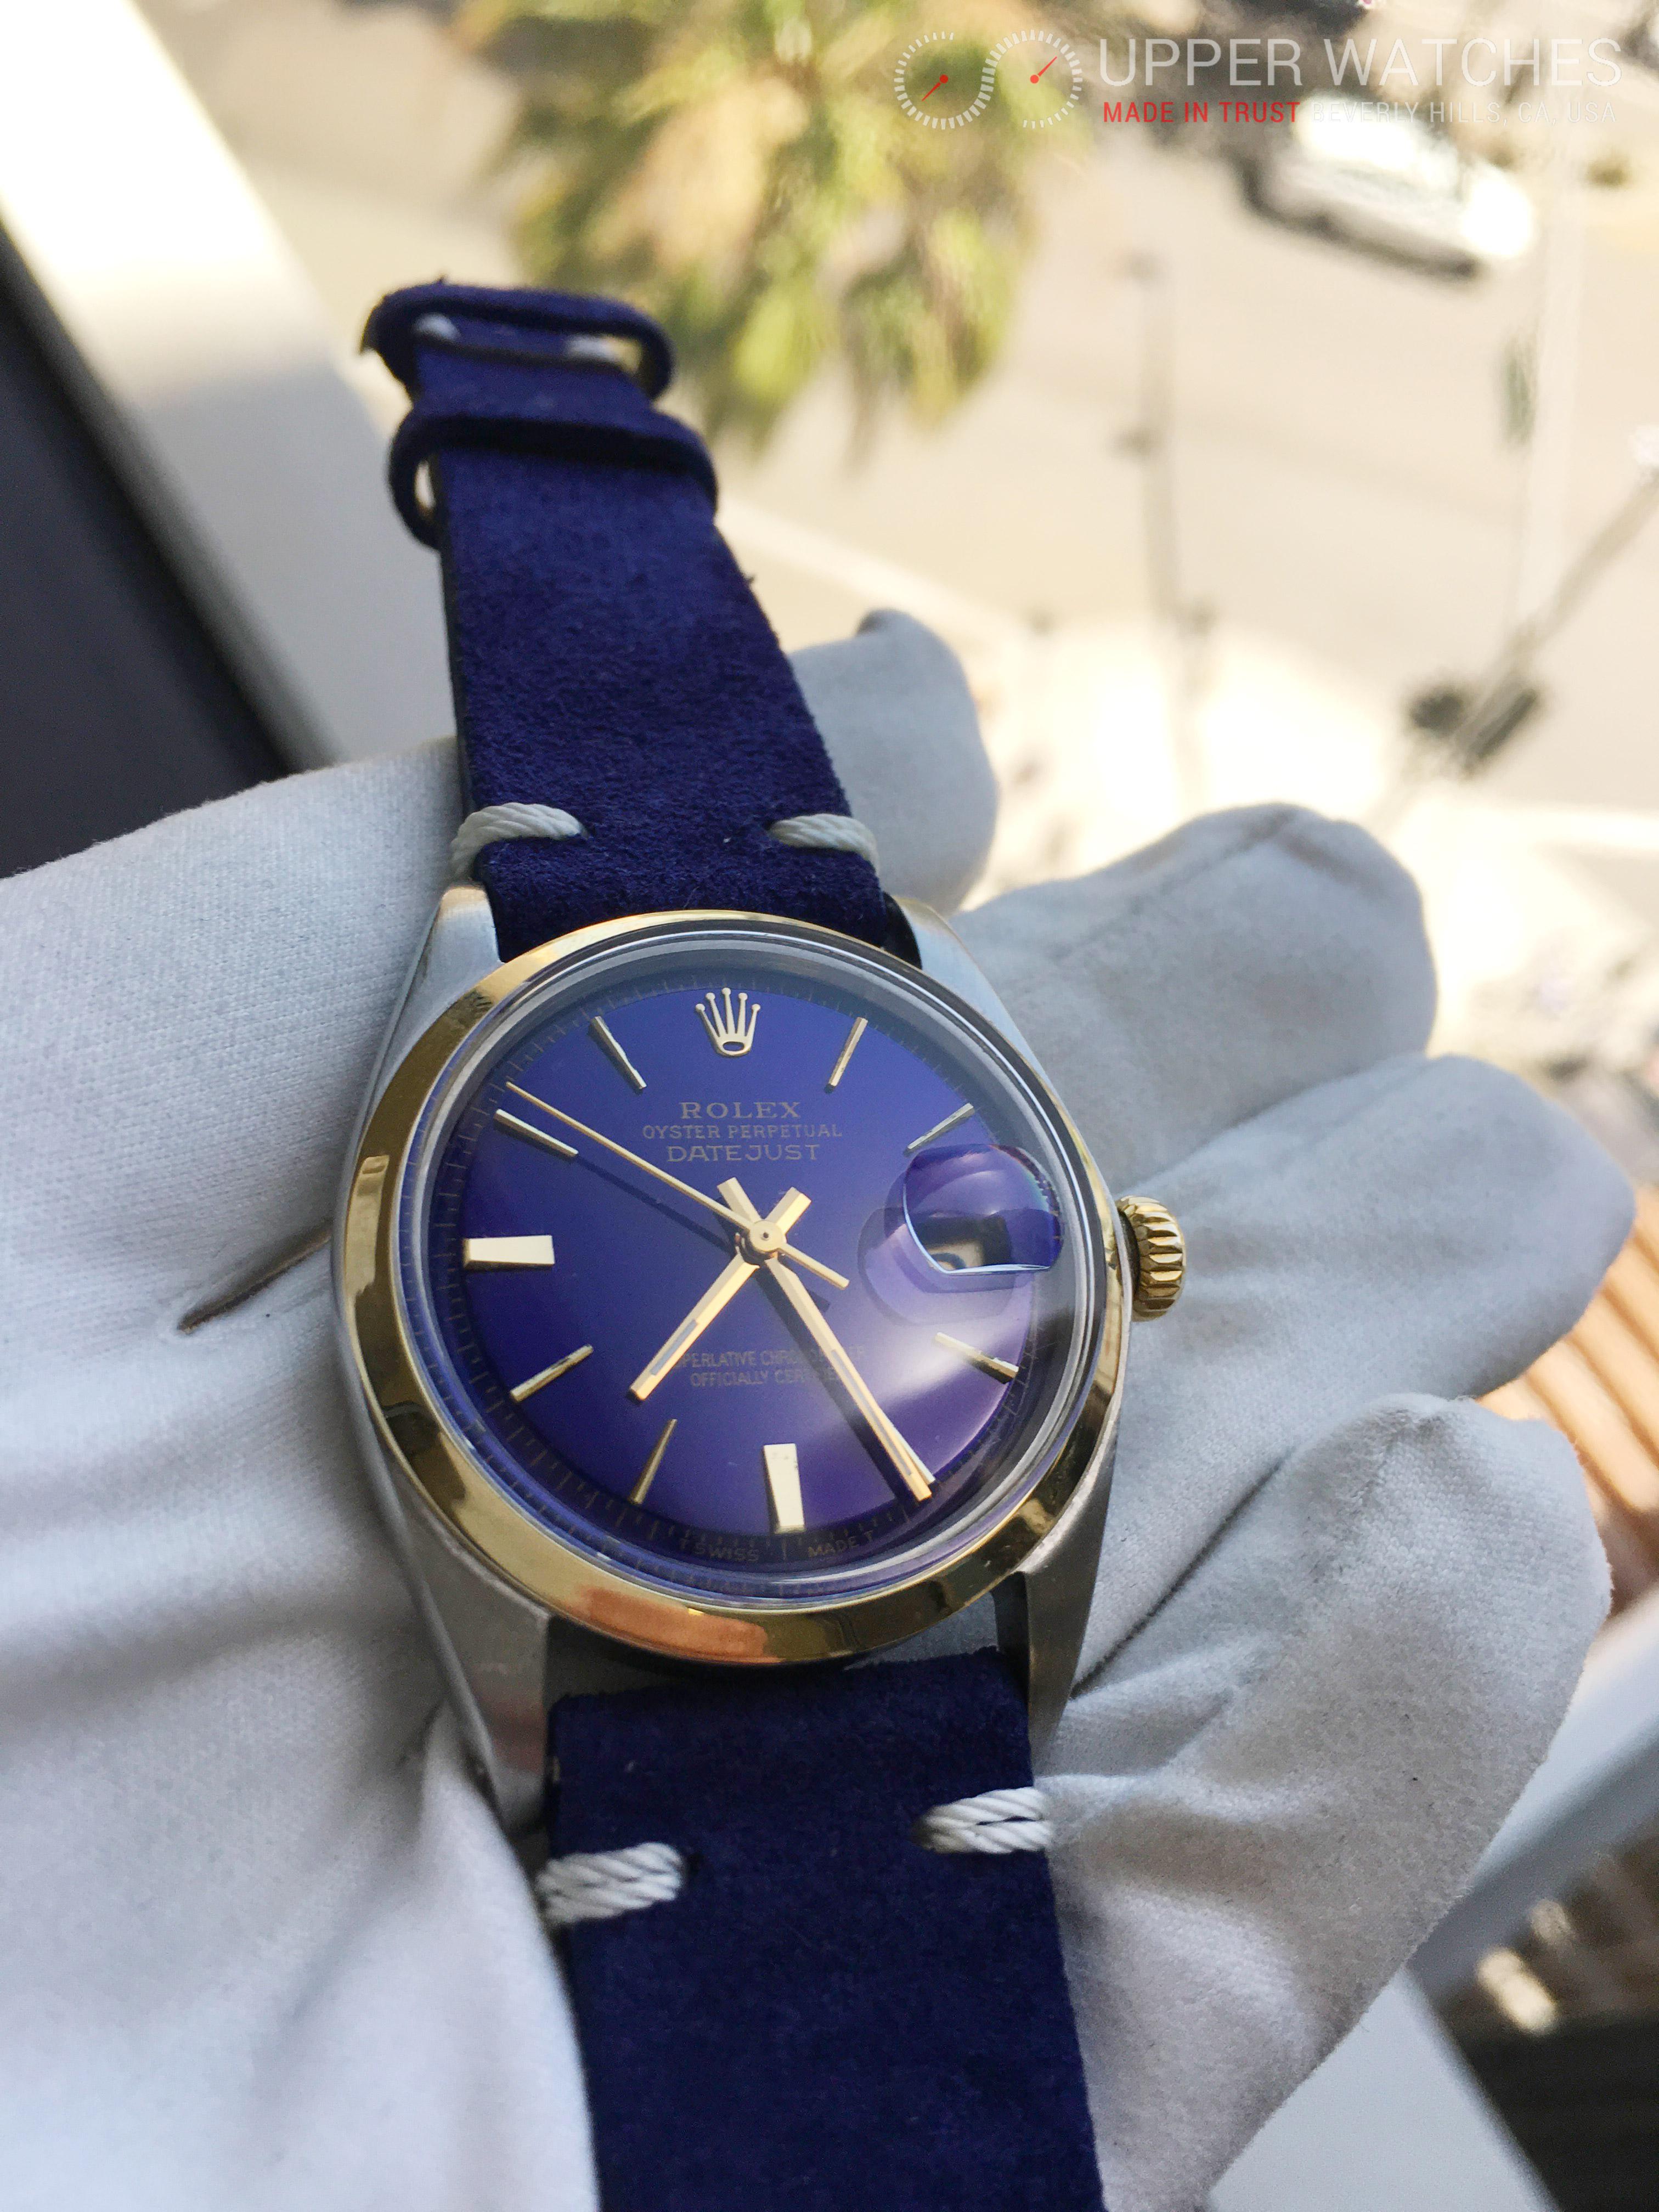 Rolex Datejust 1601 Blue Dial - Upper Watches